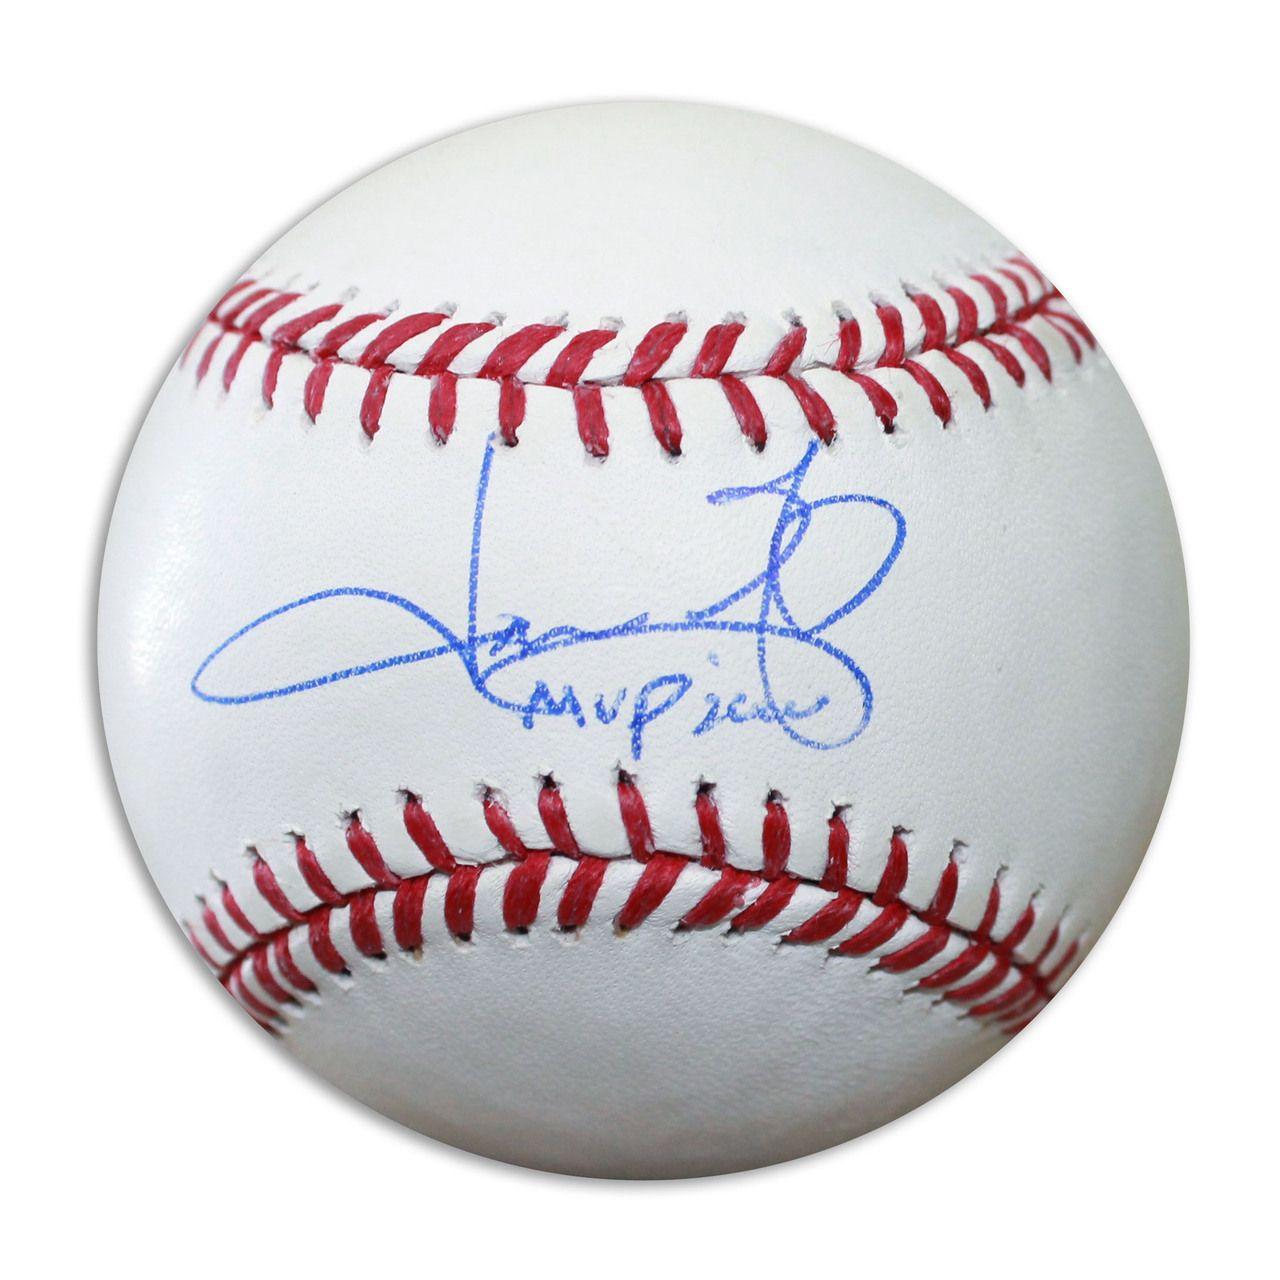 Jason Giambi Autographed Official Mlb Baseball Inscribed Mvp 2000 Jason Giambi Mlb Baseball Mlb